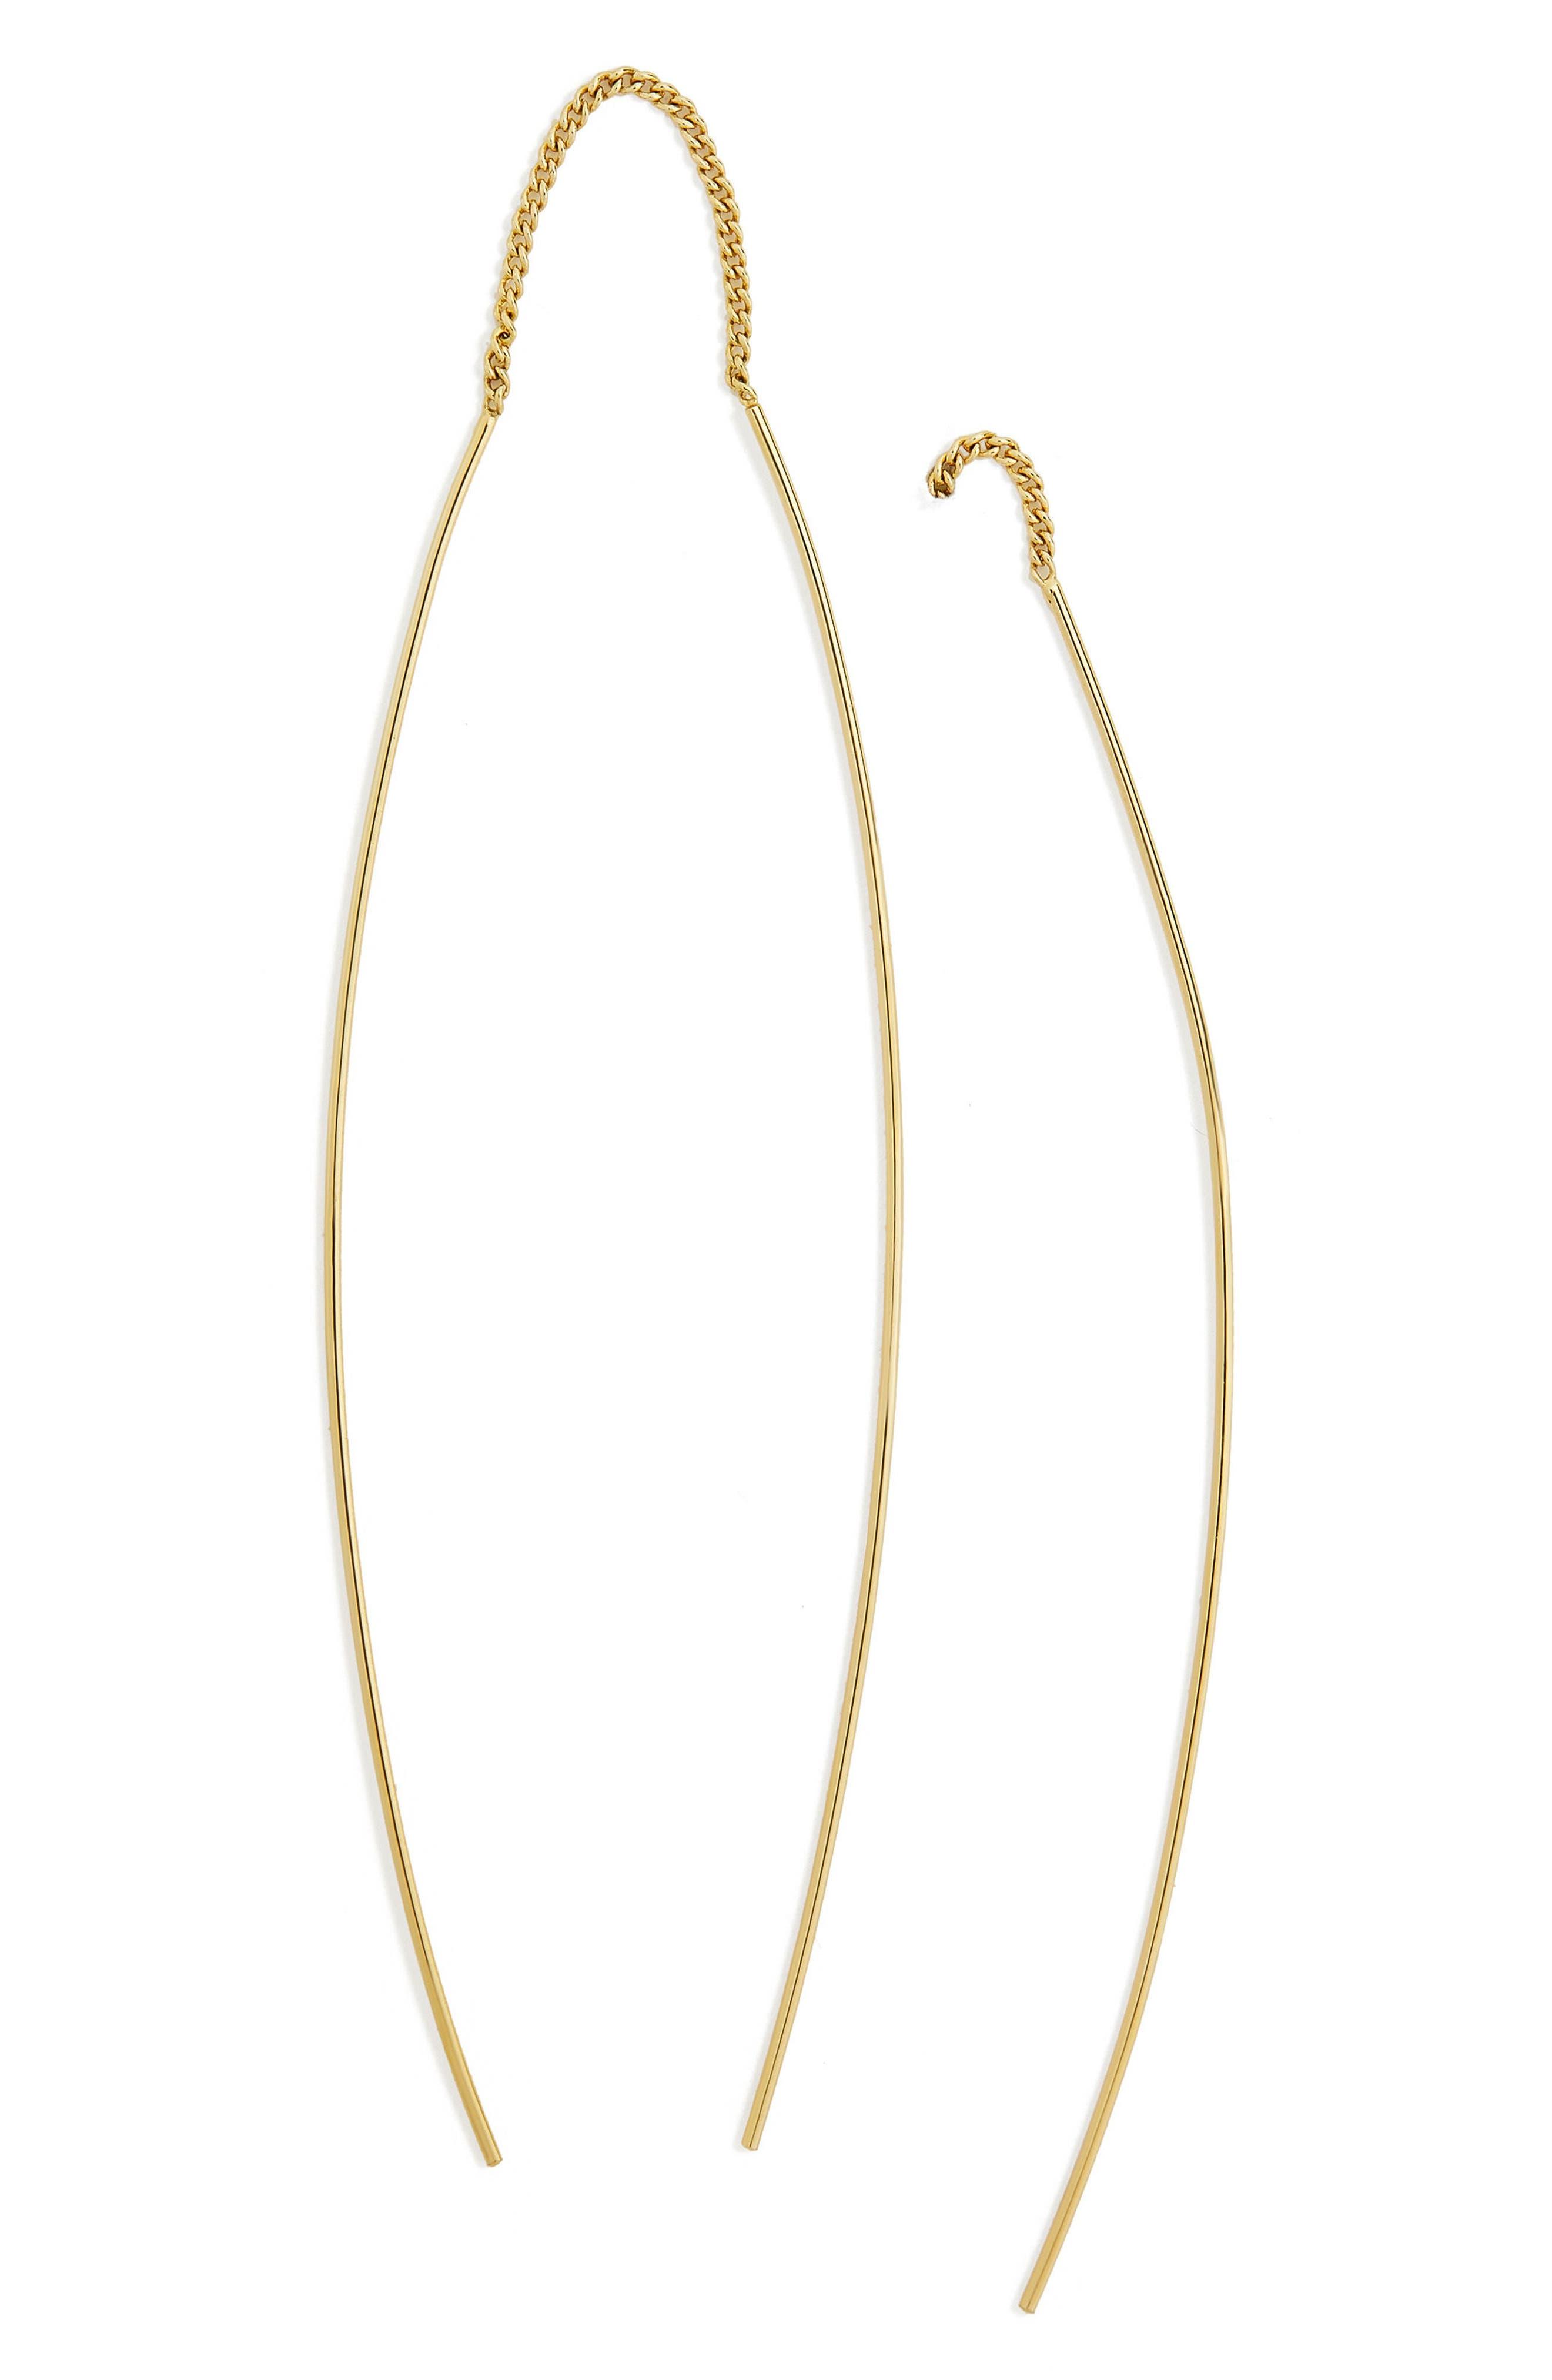 Dancer Threader Drop Earrings,                             Main thumbnail 1, color,                             Gold